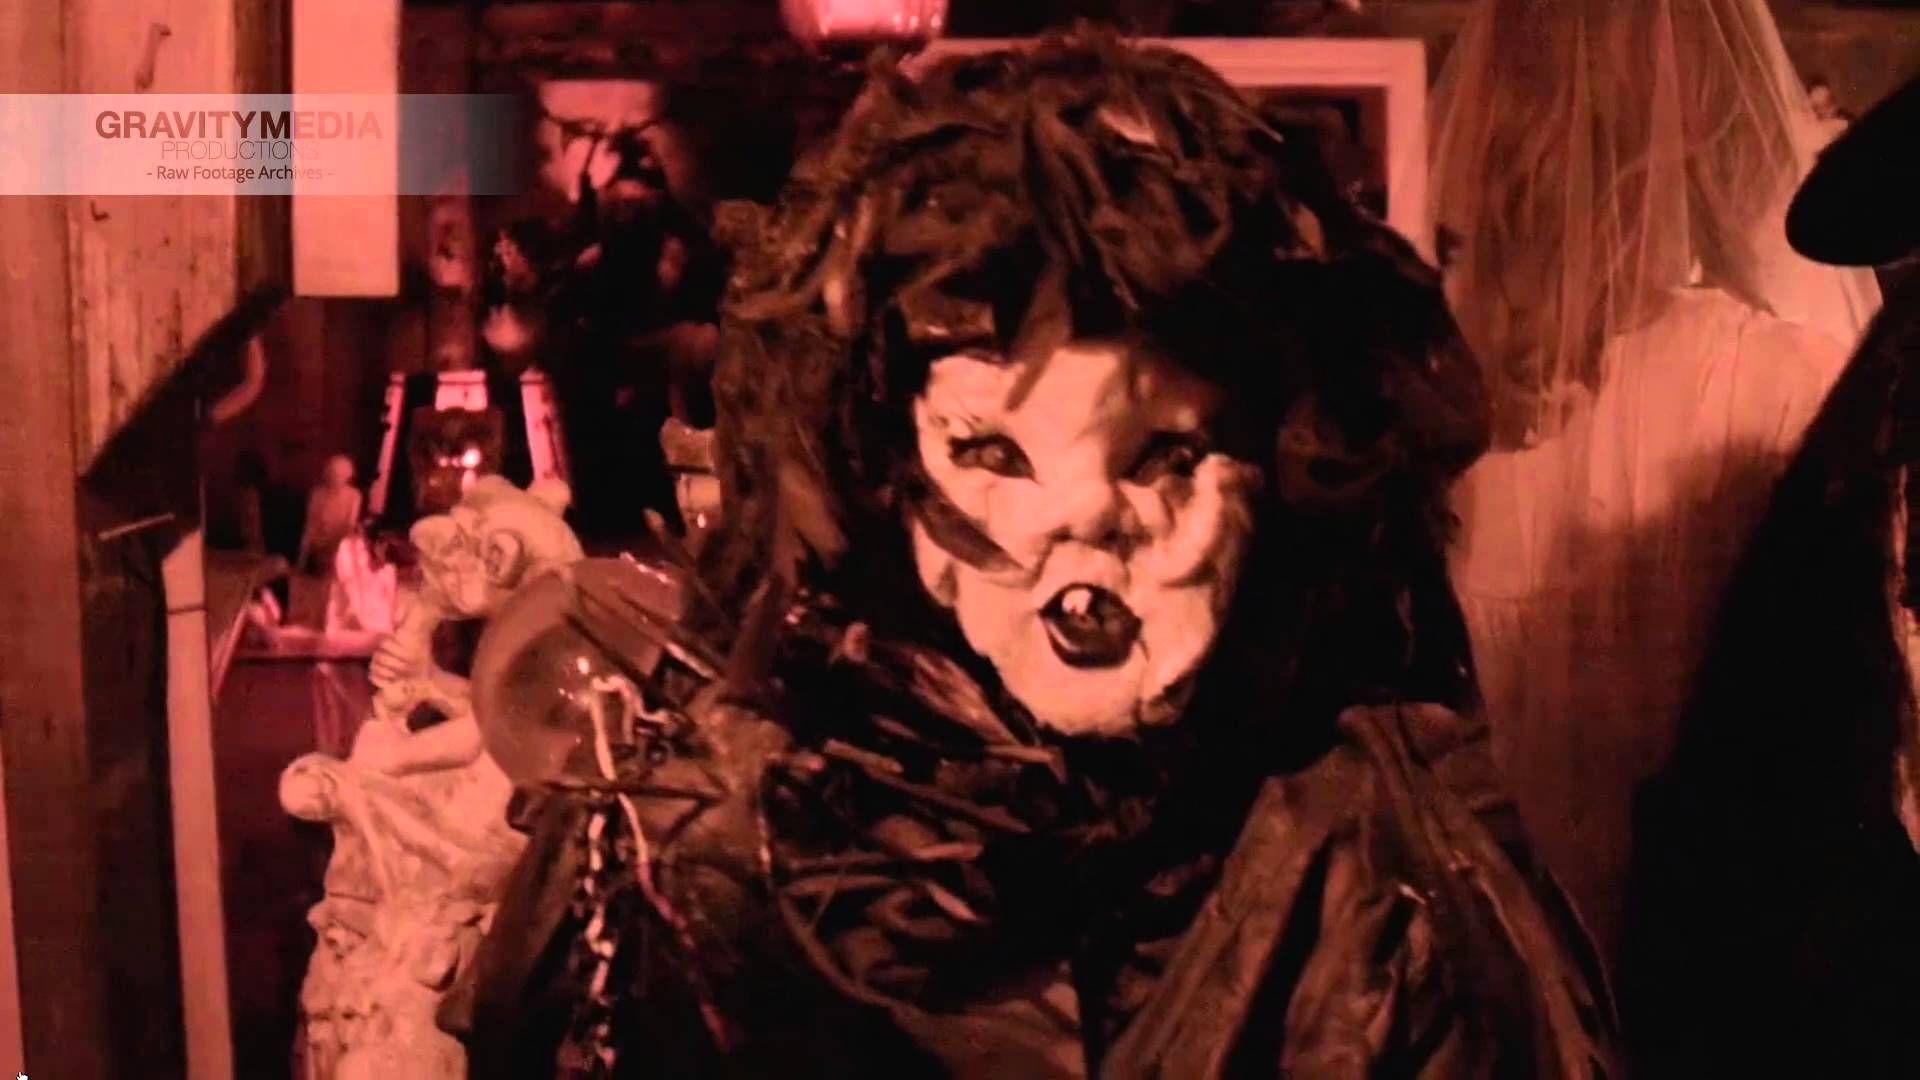 LATEST* RAW Footage inside Ed & Lorraine WARREN'S OCCULT MUSEUM ...